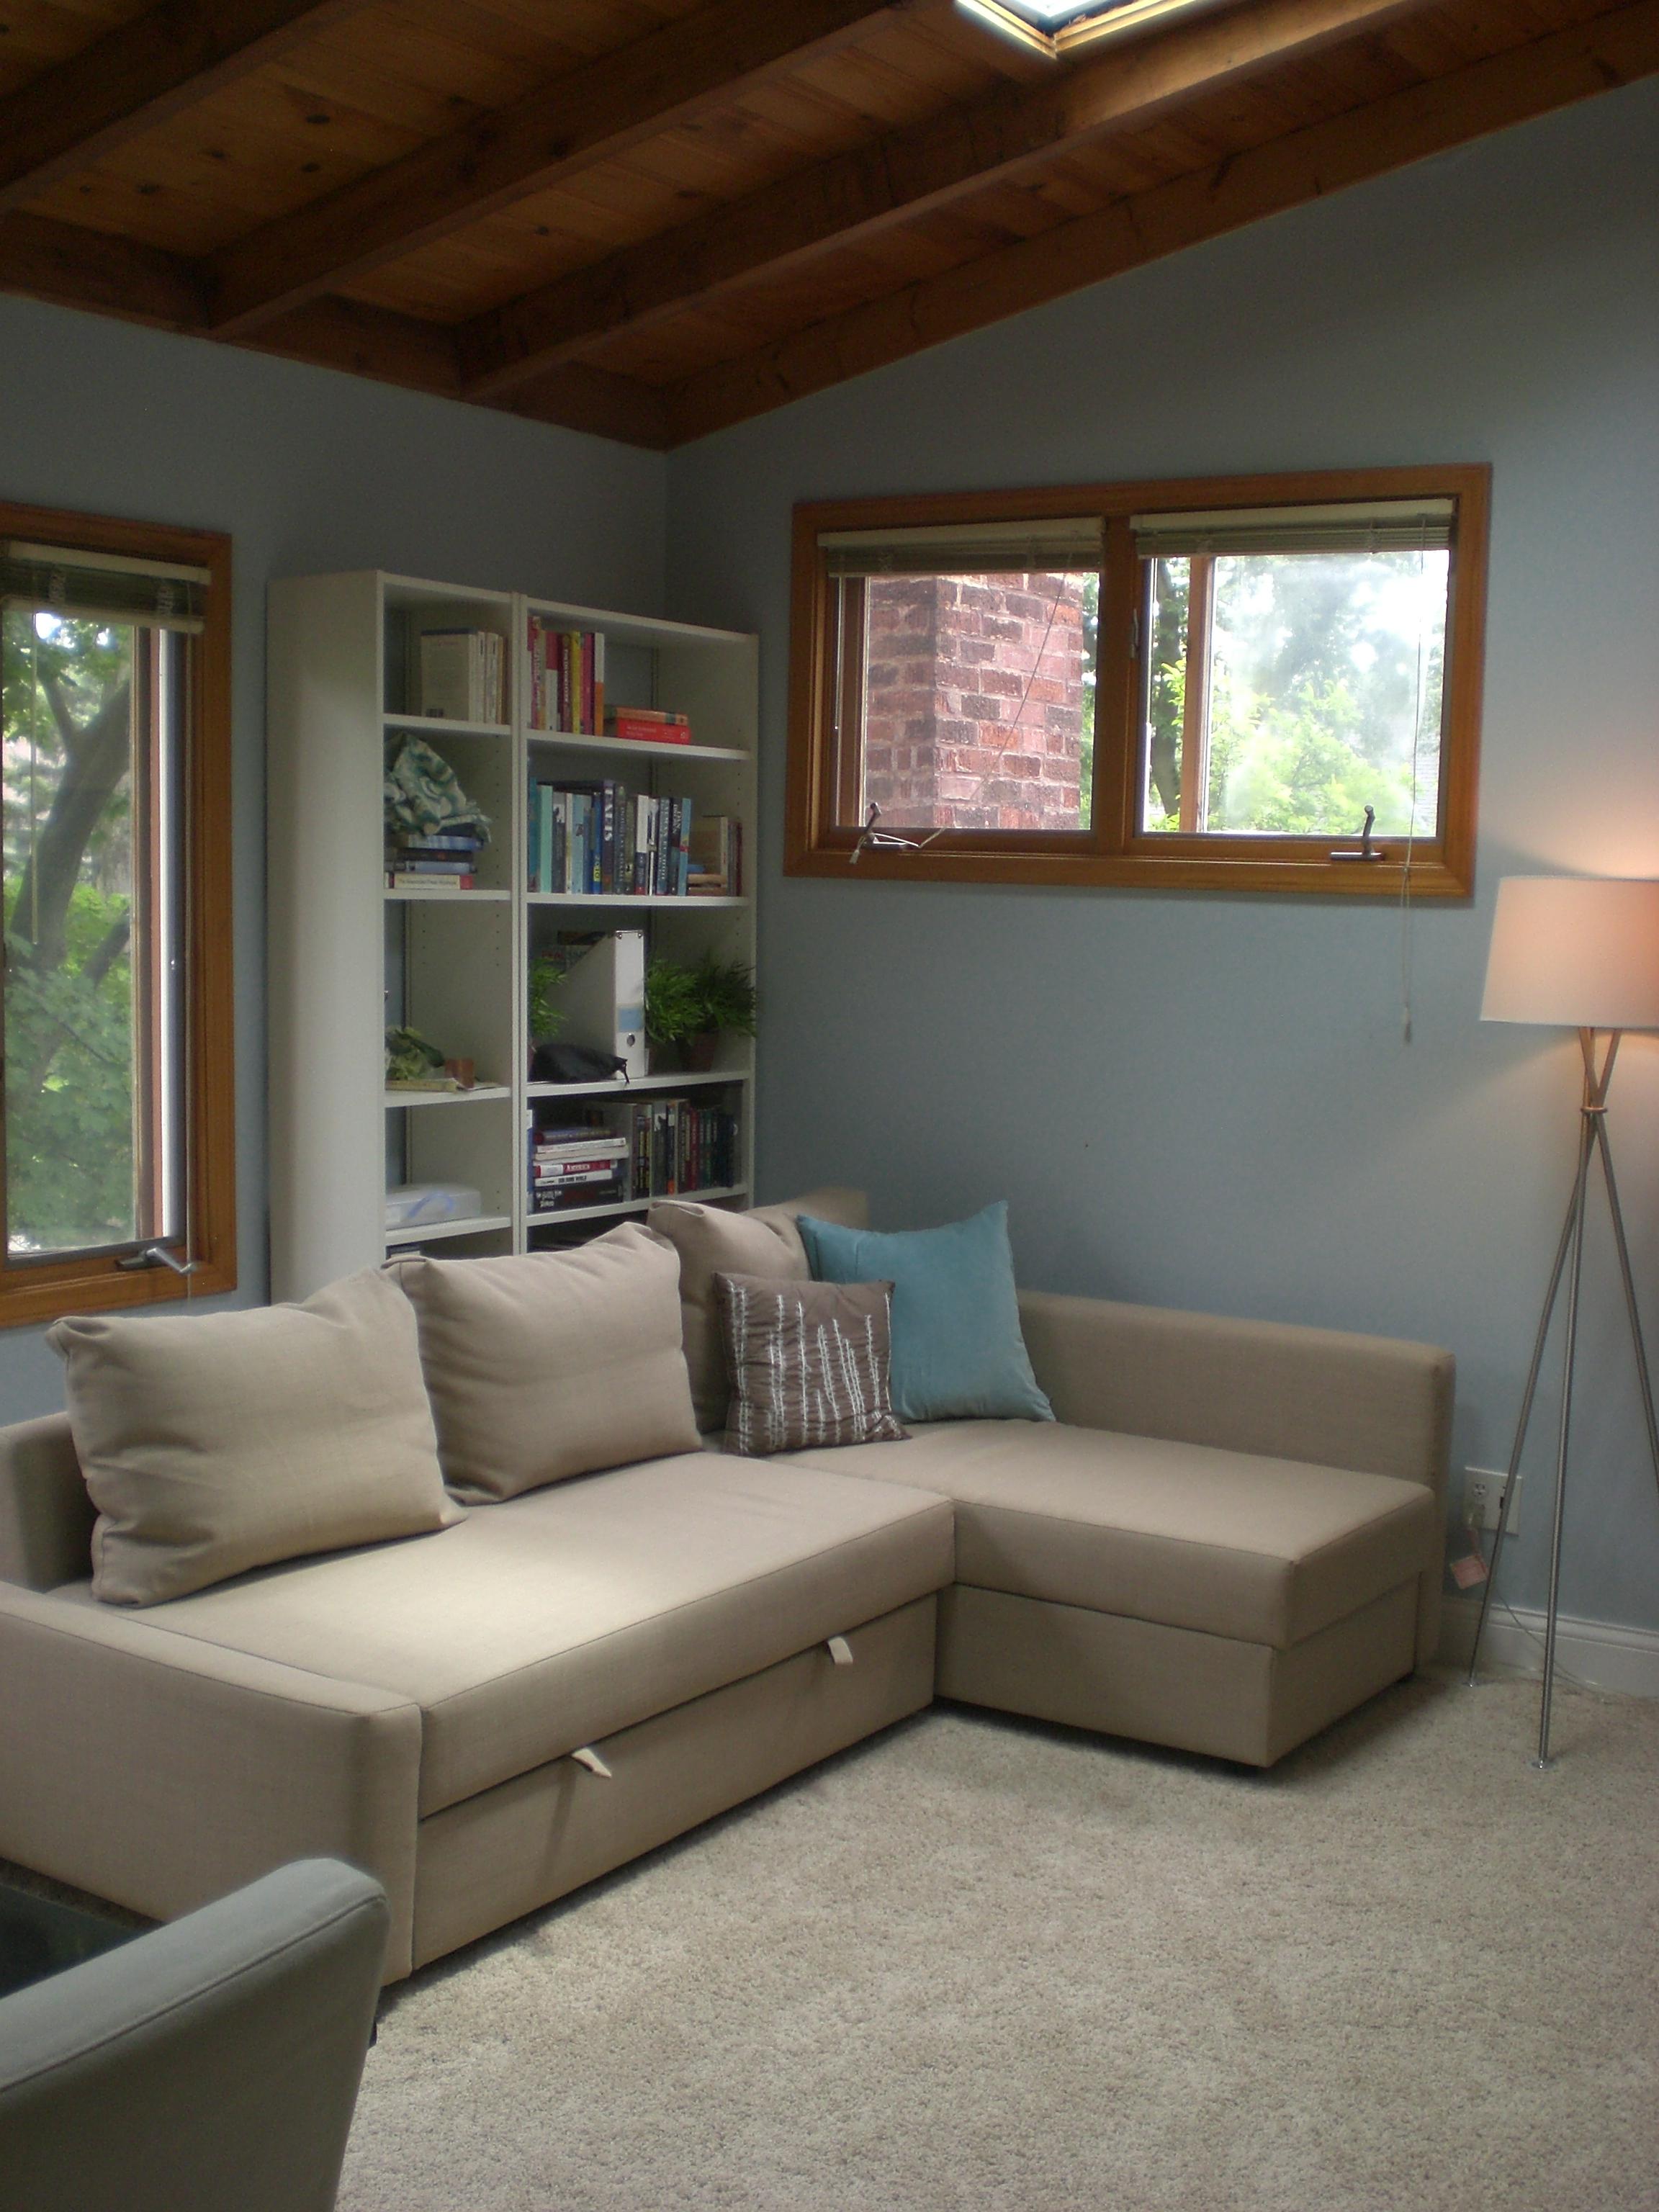 overhead sofa floor lamp refurbish leather cushions buh-bye yellow!